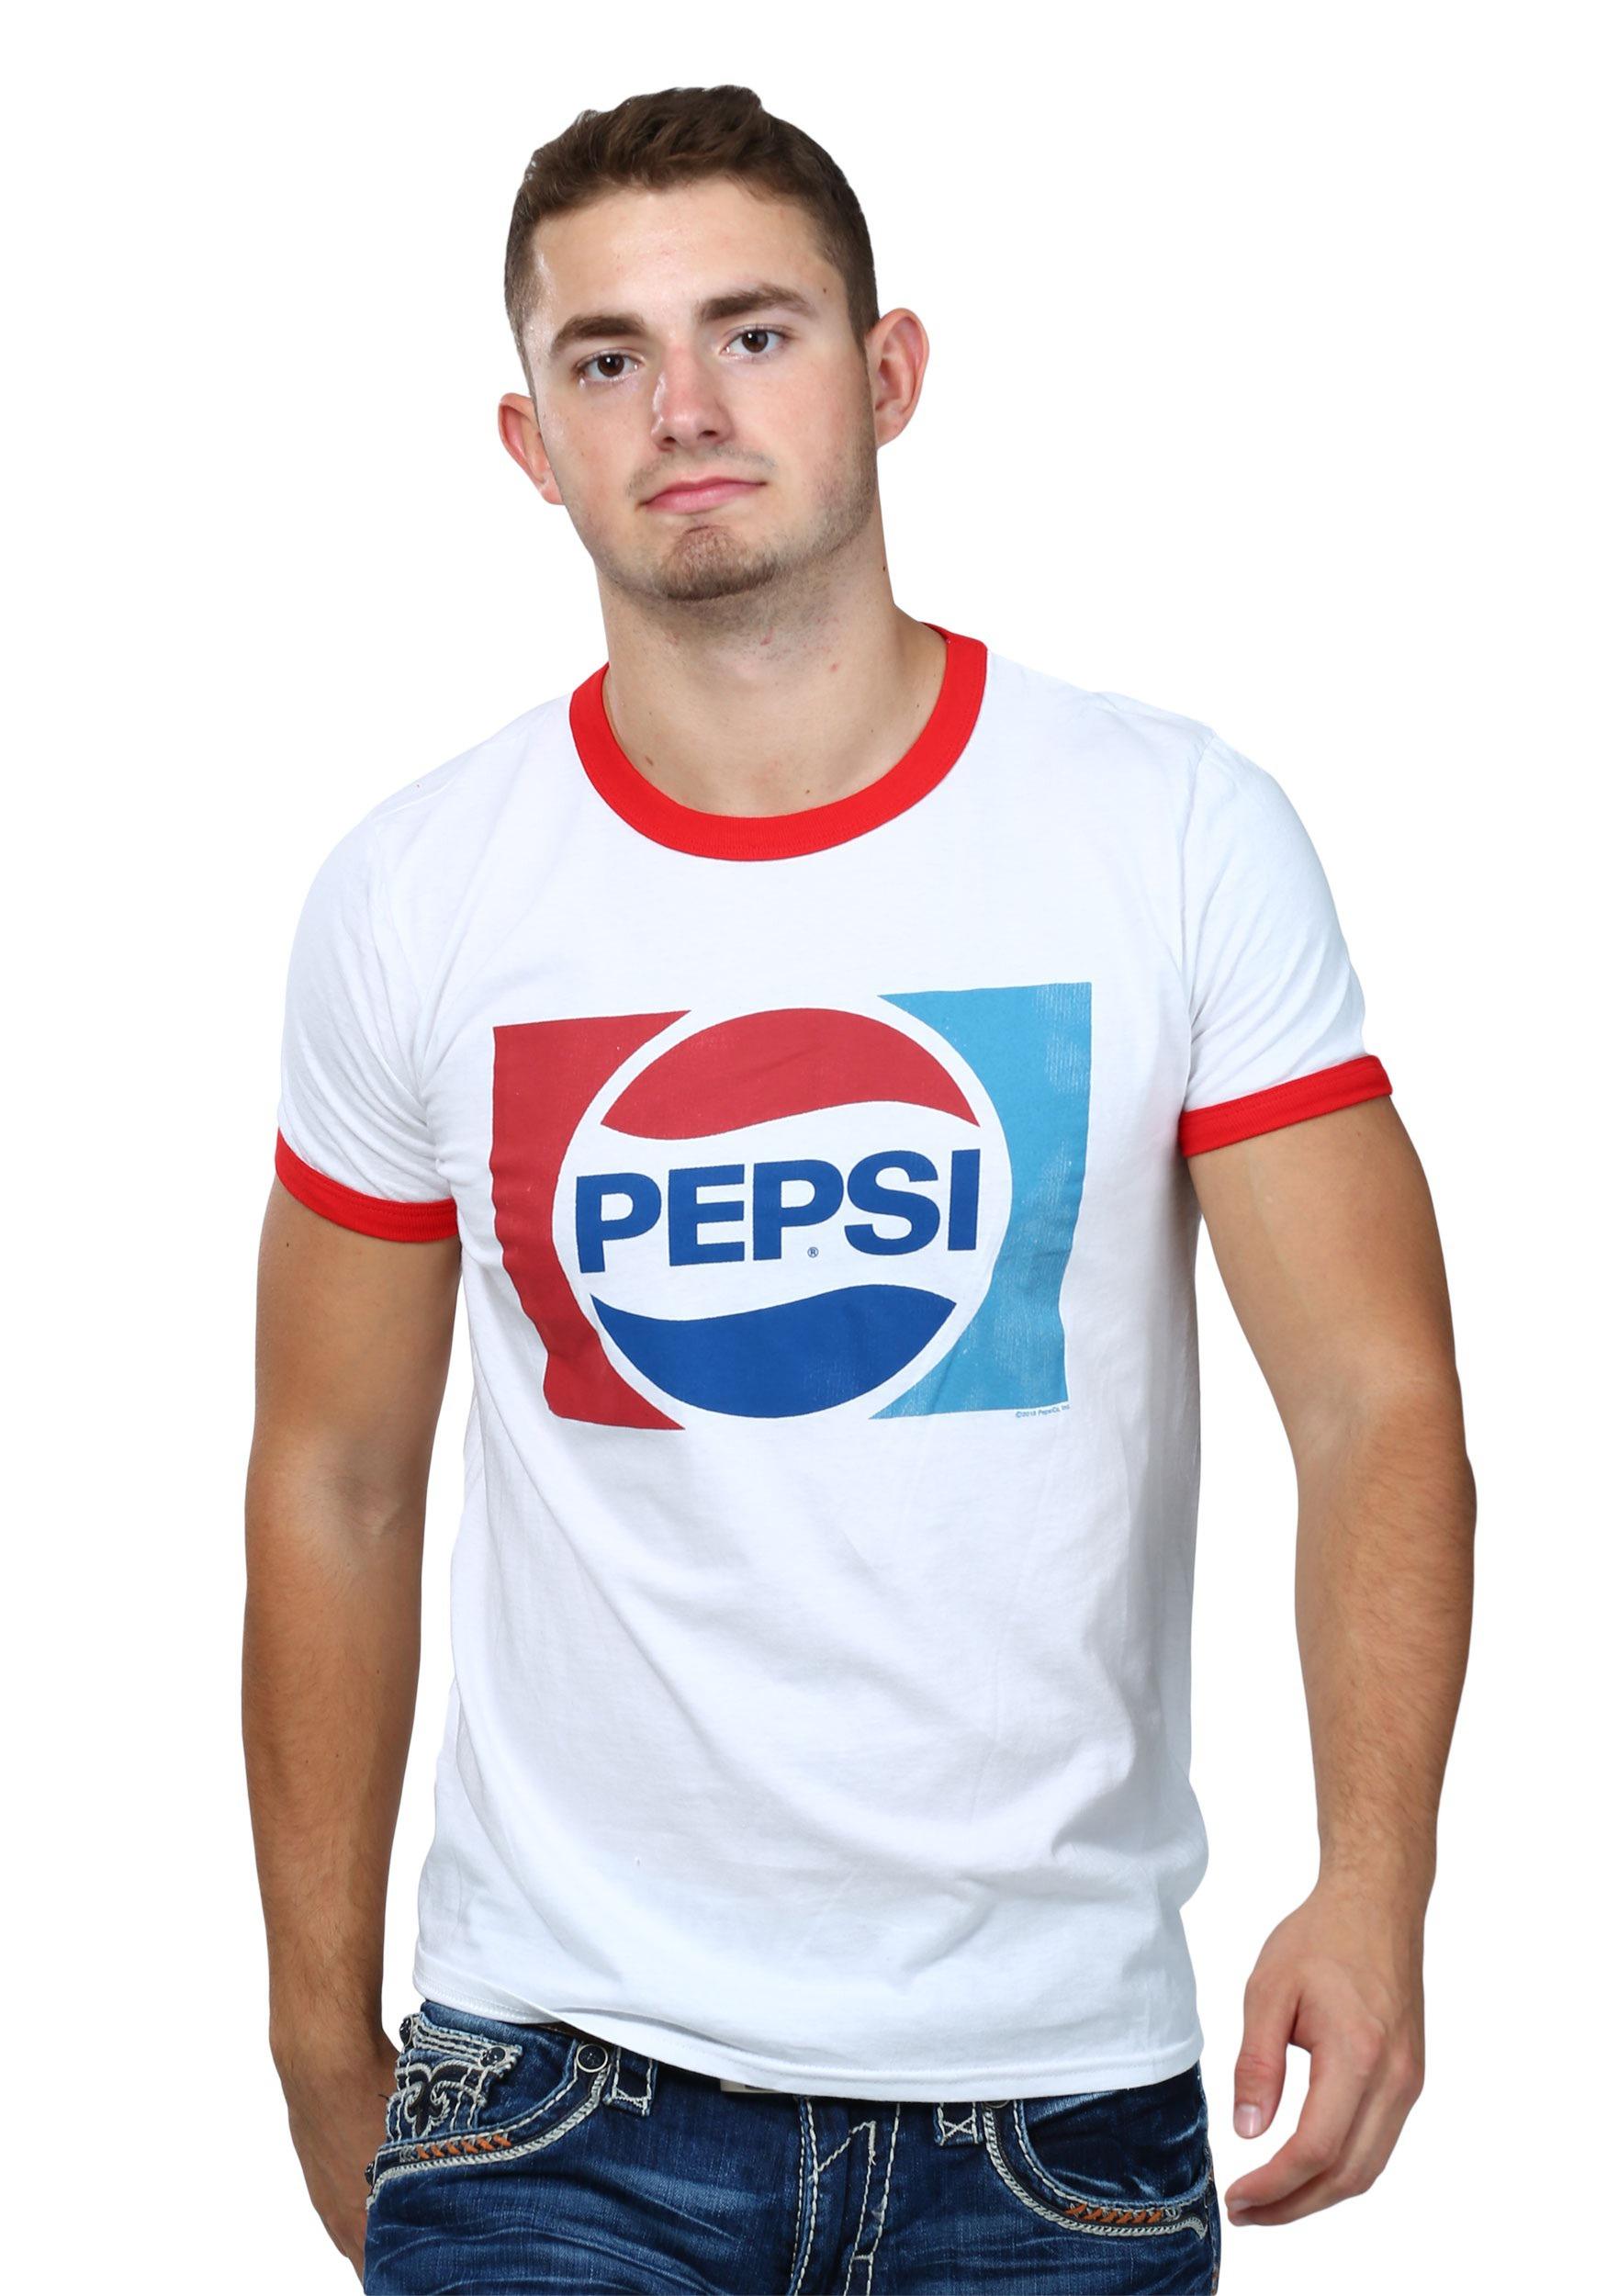 Pepsi 70s logo ringer t shirt pepsi logo mens ringer shirt sciox Image collections